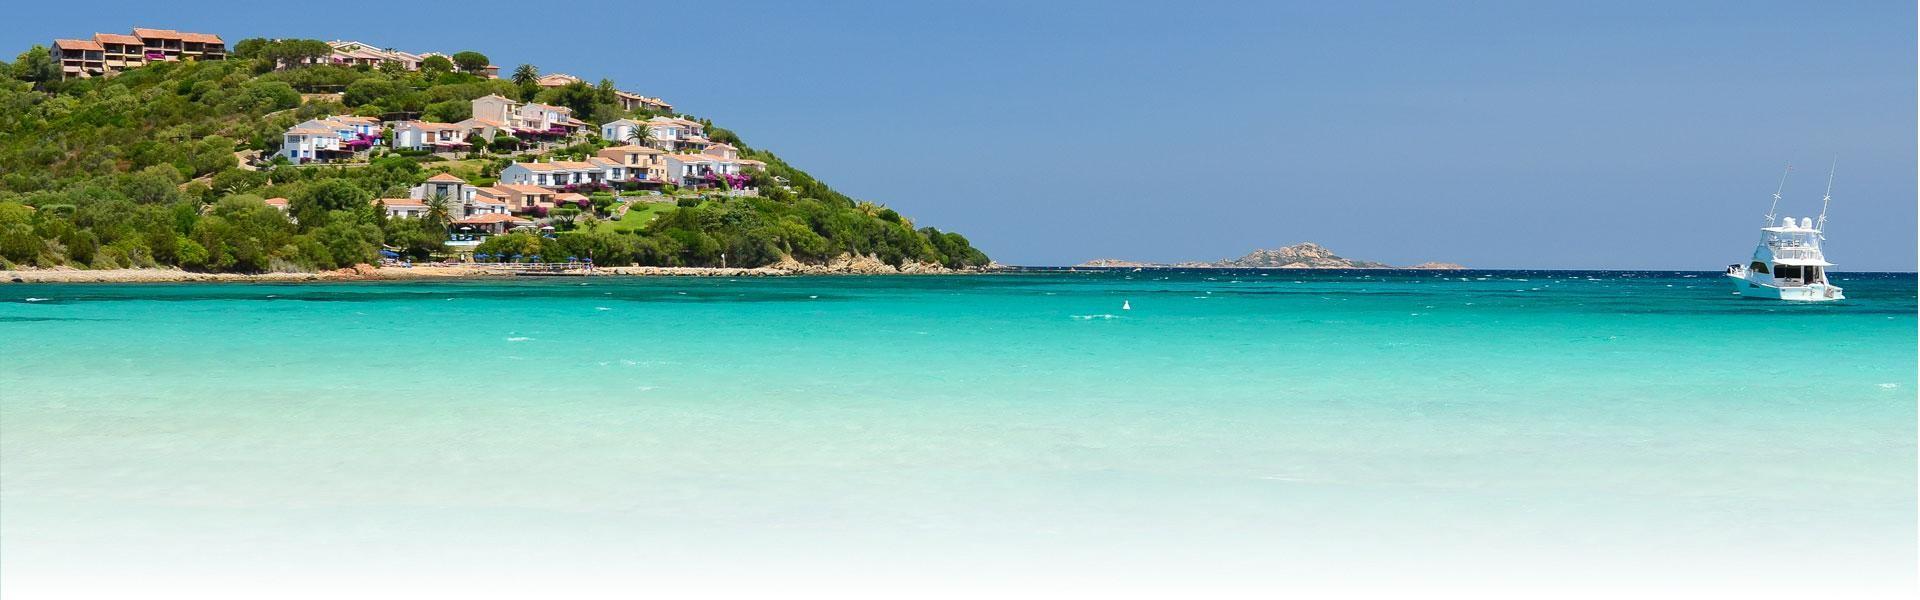 Beach Villa Italy For Sale